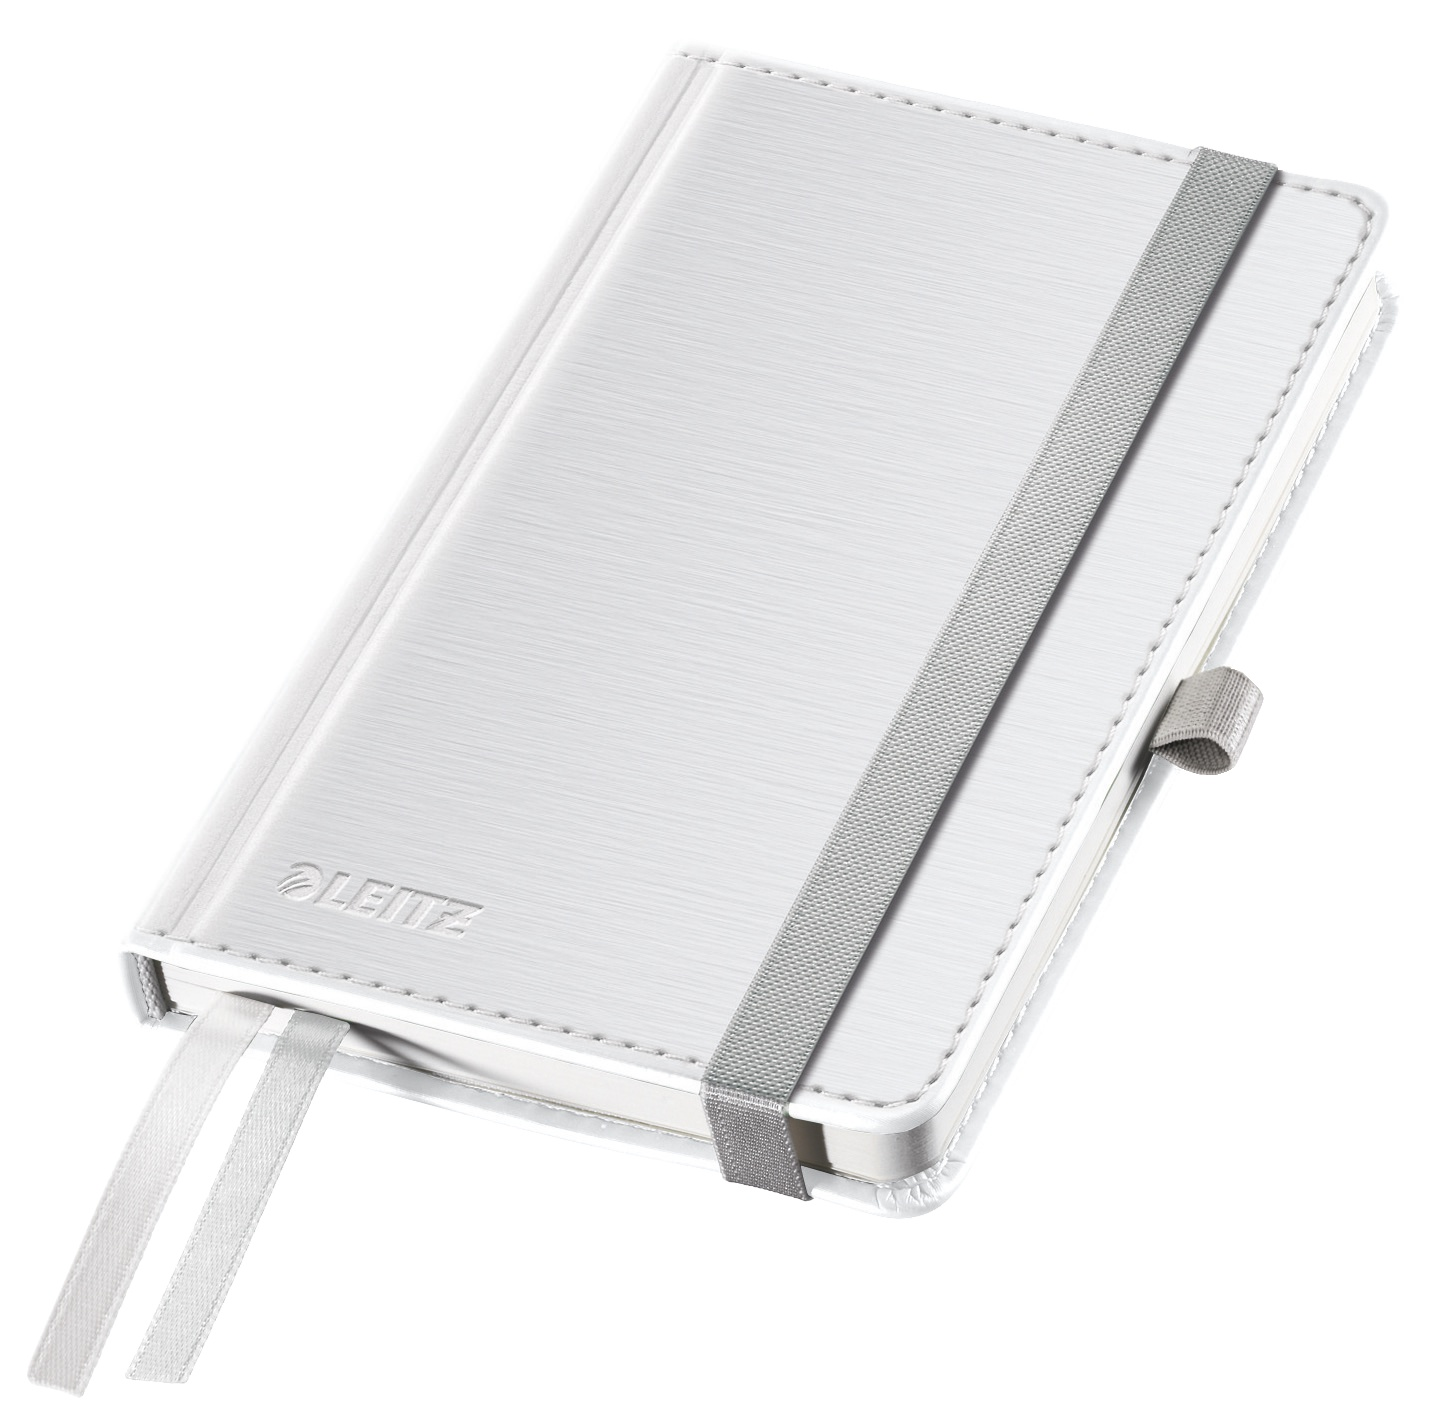 Записная книжка Leitz Записная книга Style, А6, клетка, белая сталь, 80